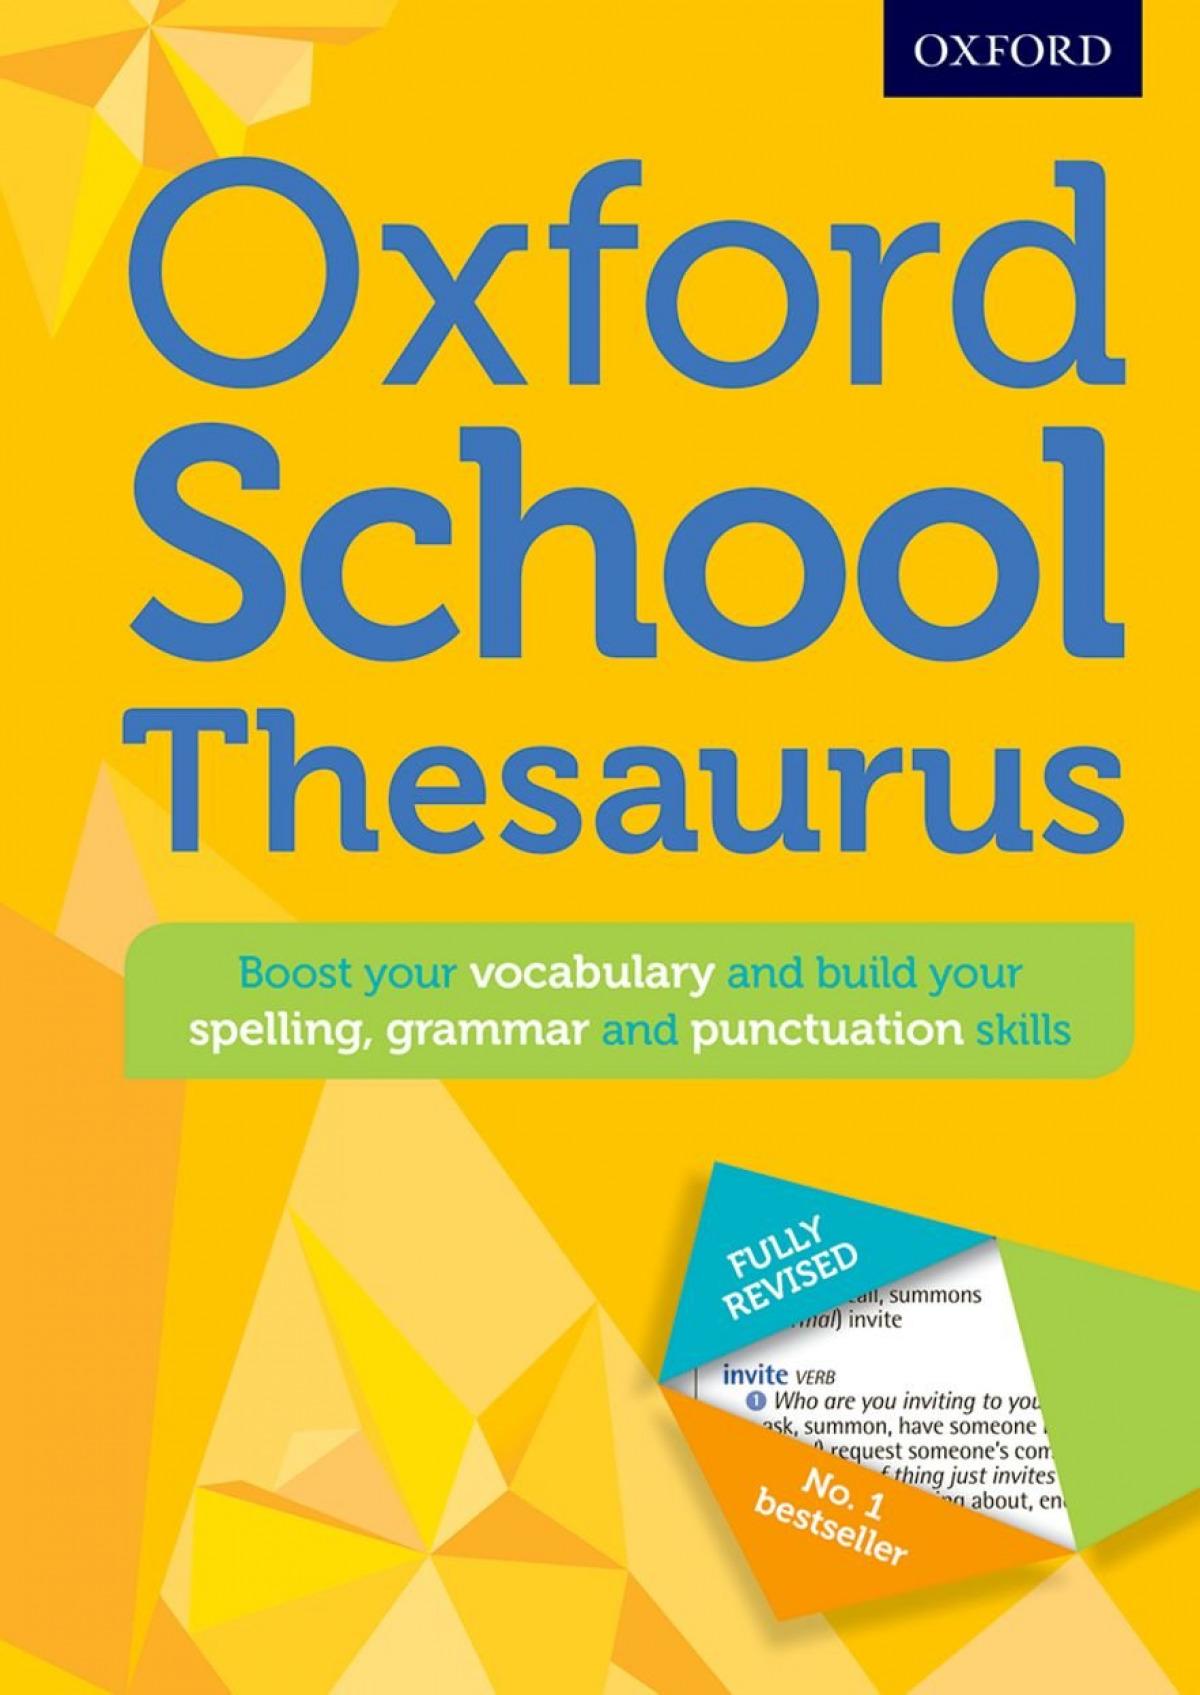 Oxford School Thesaurus. 2016